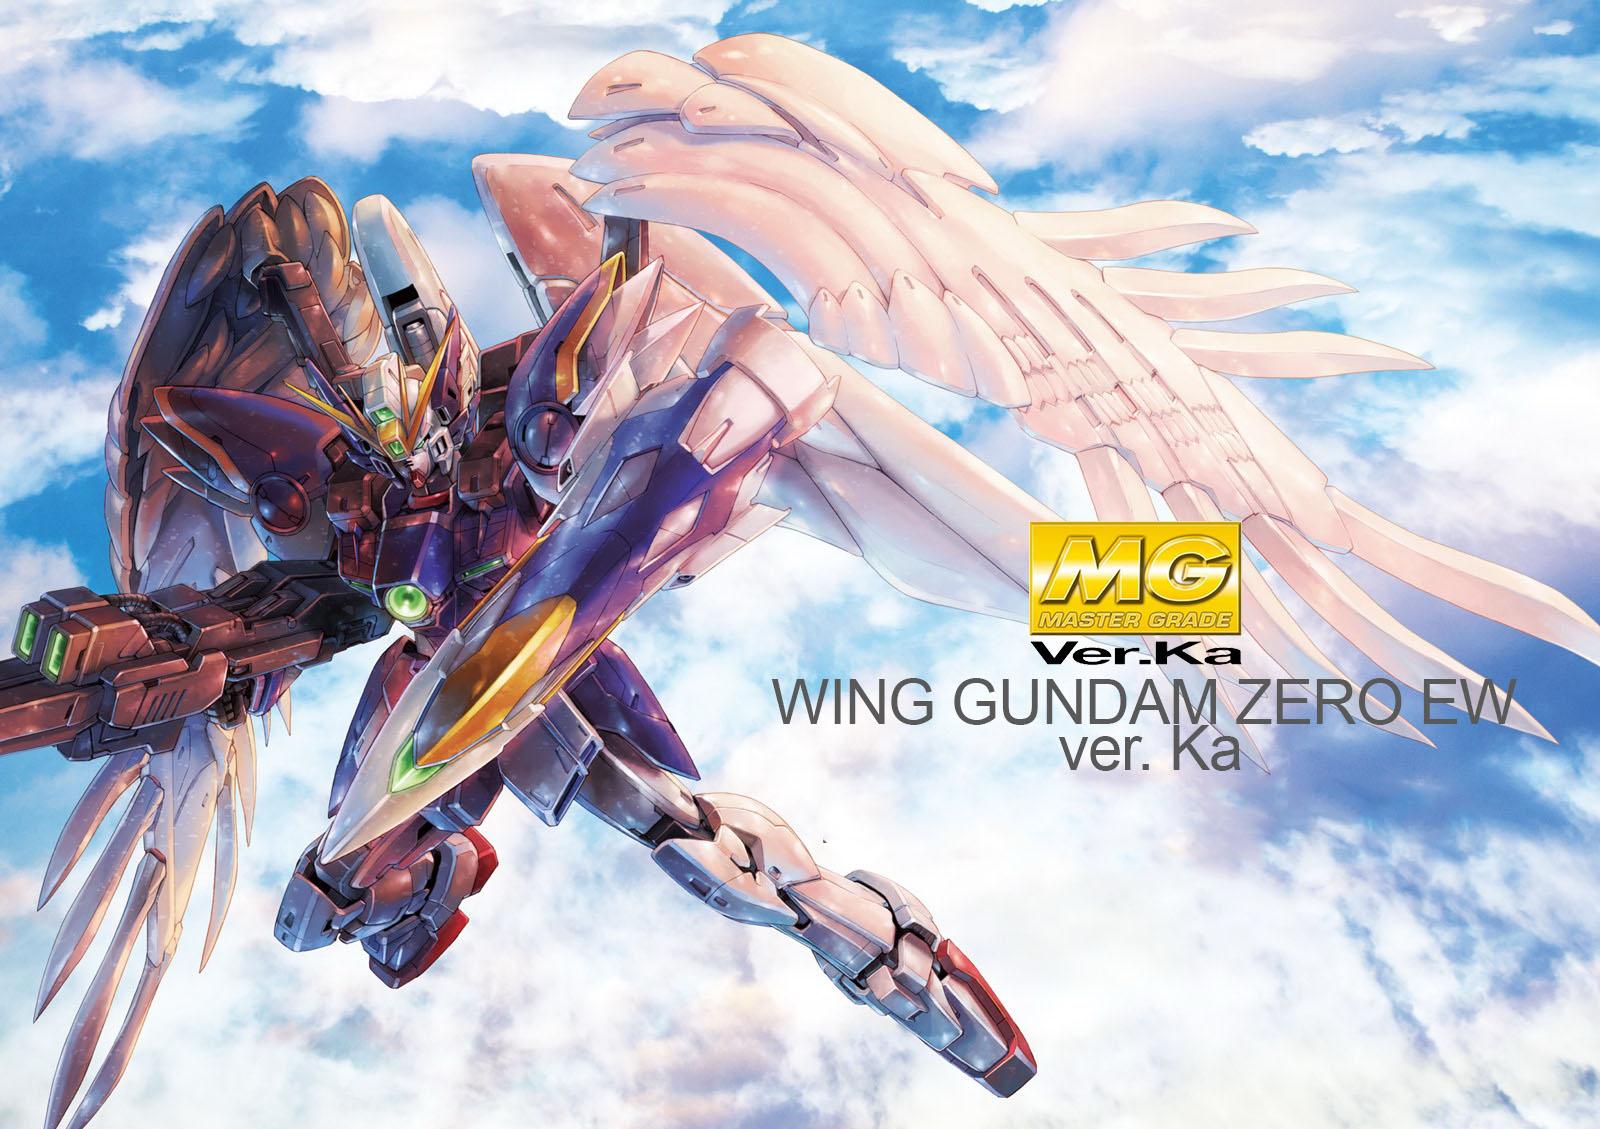 New Bandai Gundam Wing 1//100 MG Wing Gundam Zero Endless Waltz Ver Mobile Japan